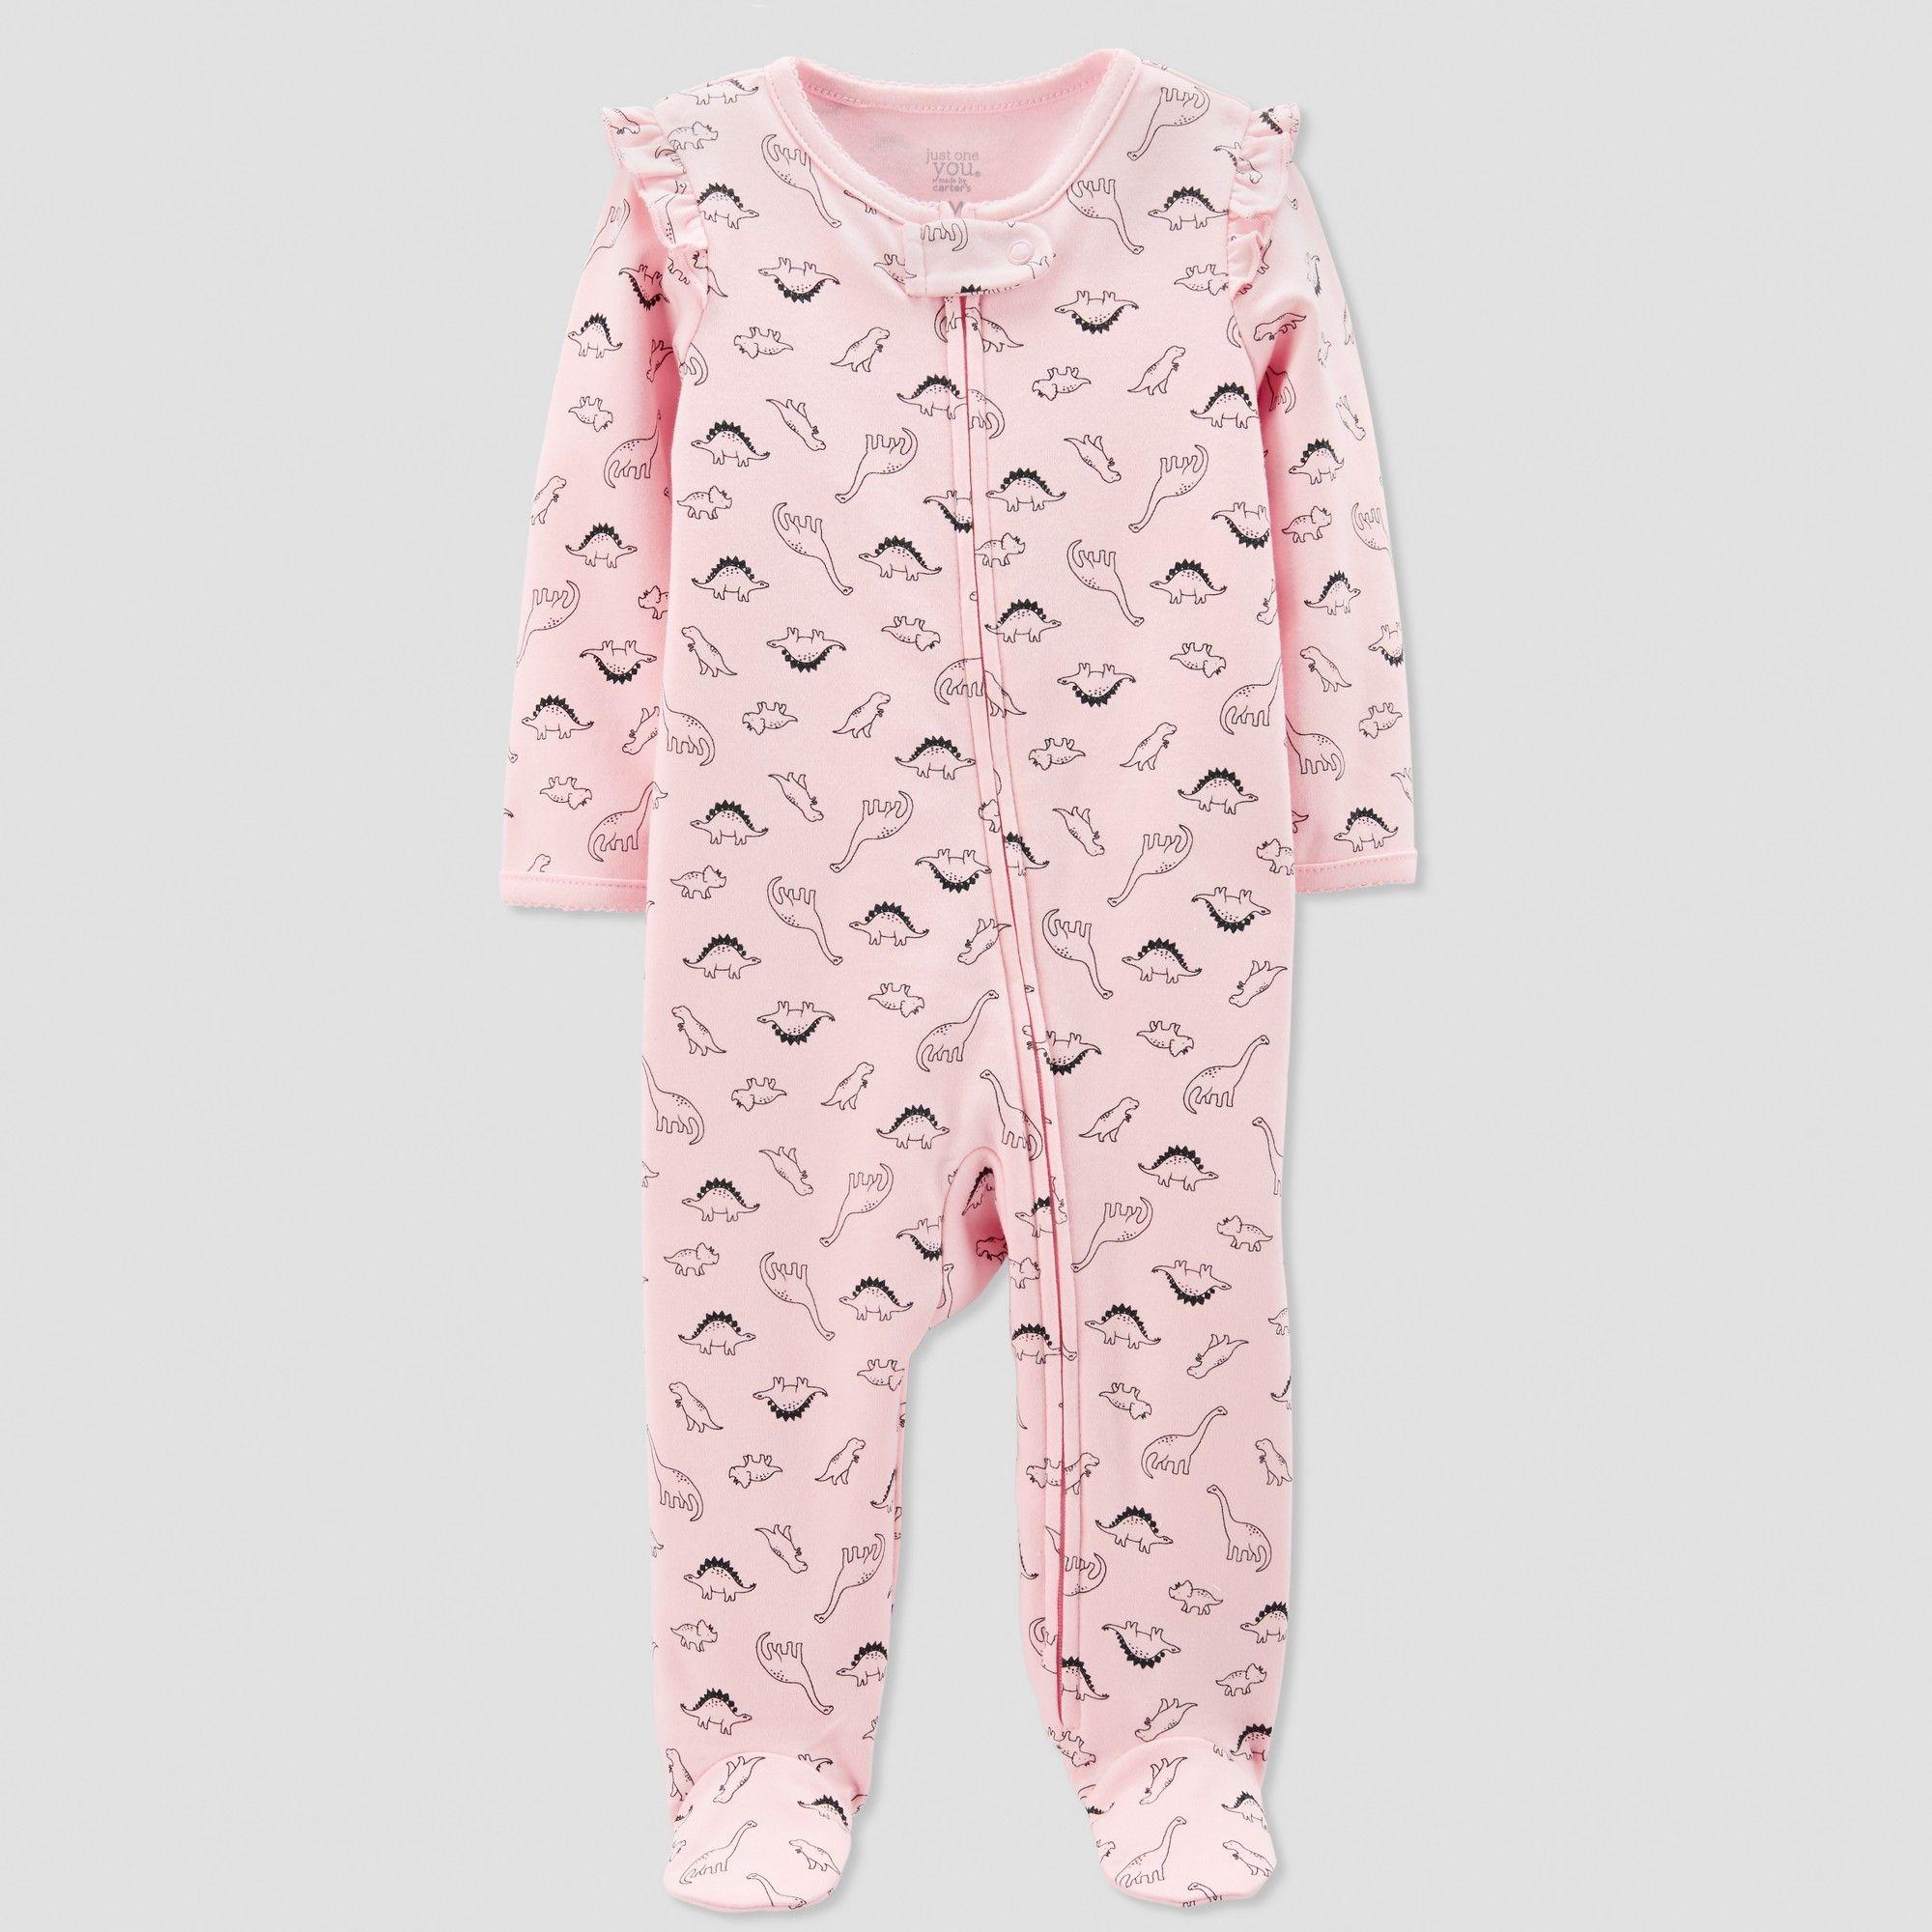 cc47dea8e72c Baby Girls  Interlock Dino Sleep  N Play - Just One You made by ...